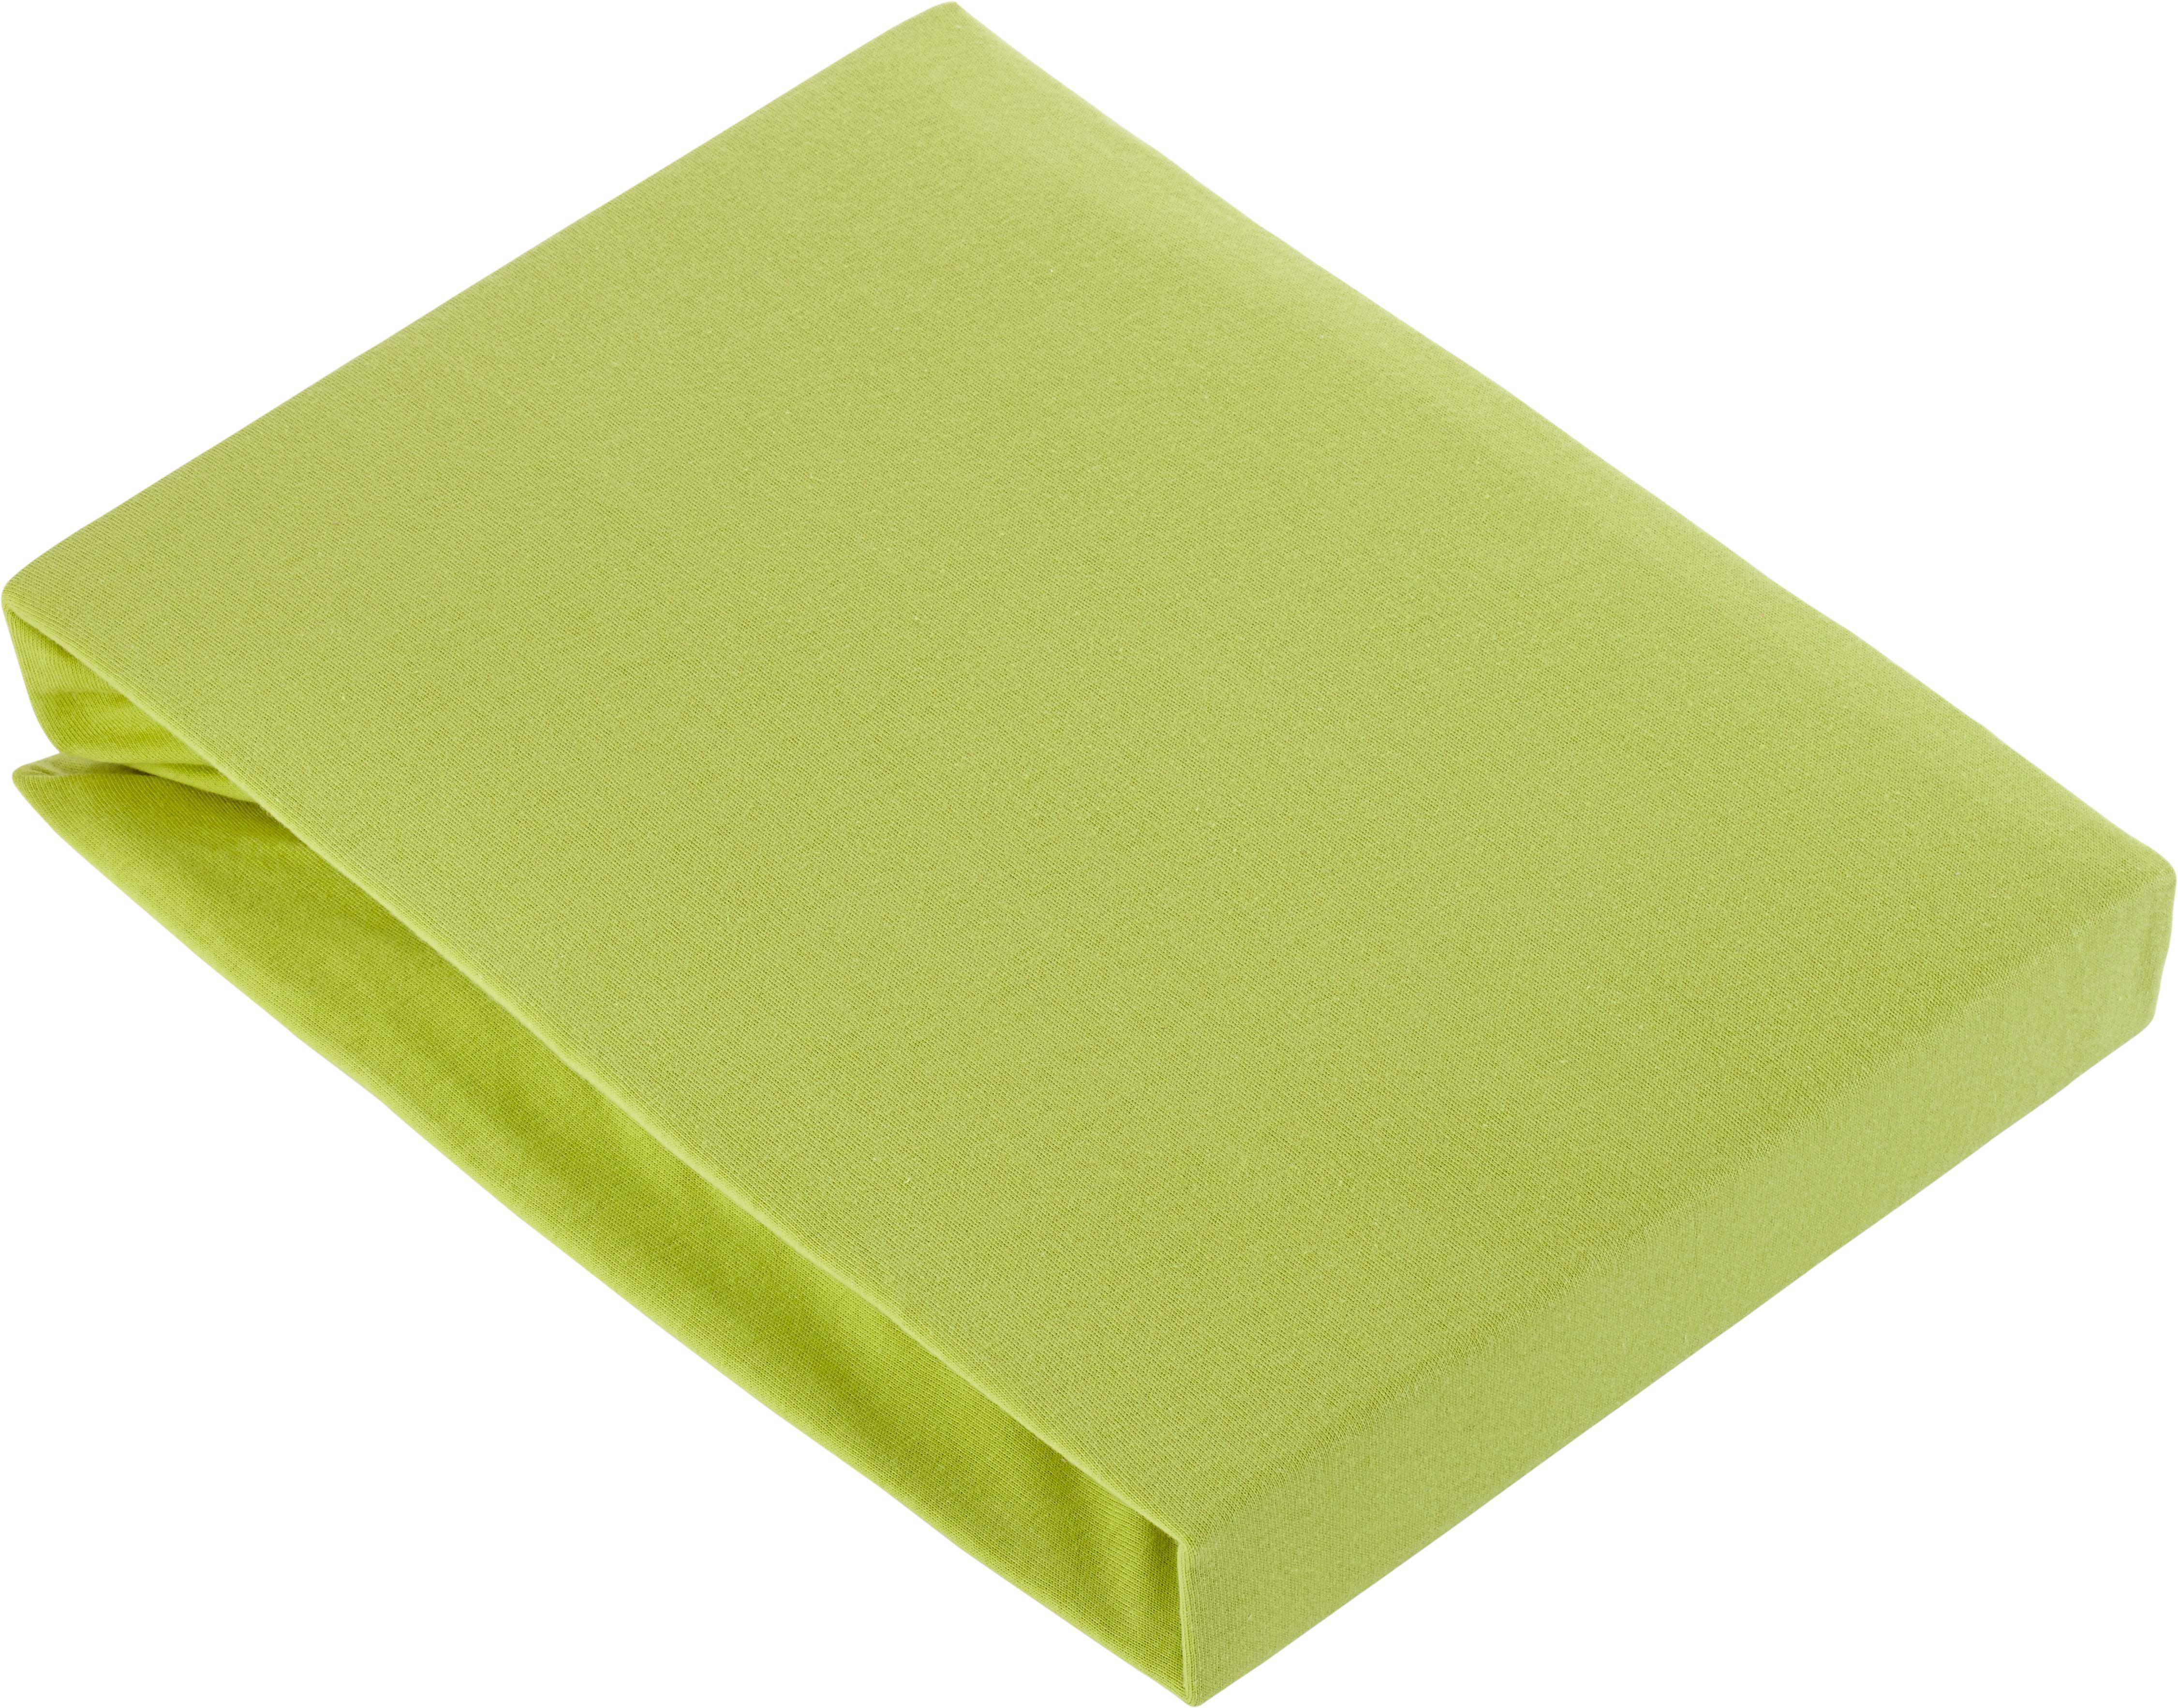 Spannbetttuch Basic in Grün, ca. 150x200cm - Grün, Textil (150/200cm) - MÖMAX modern living